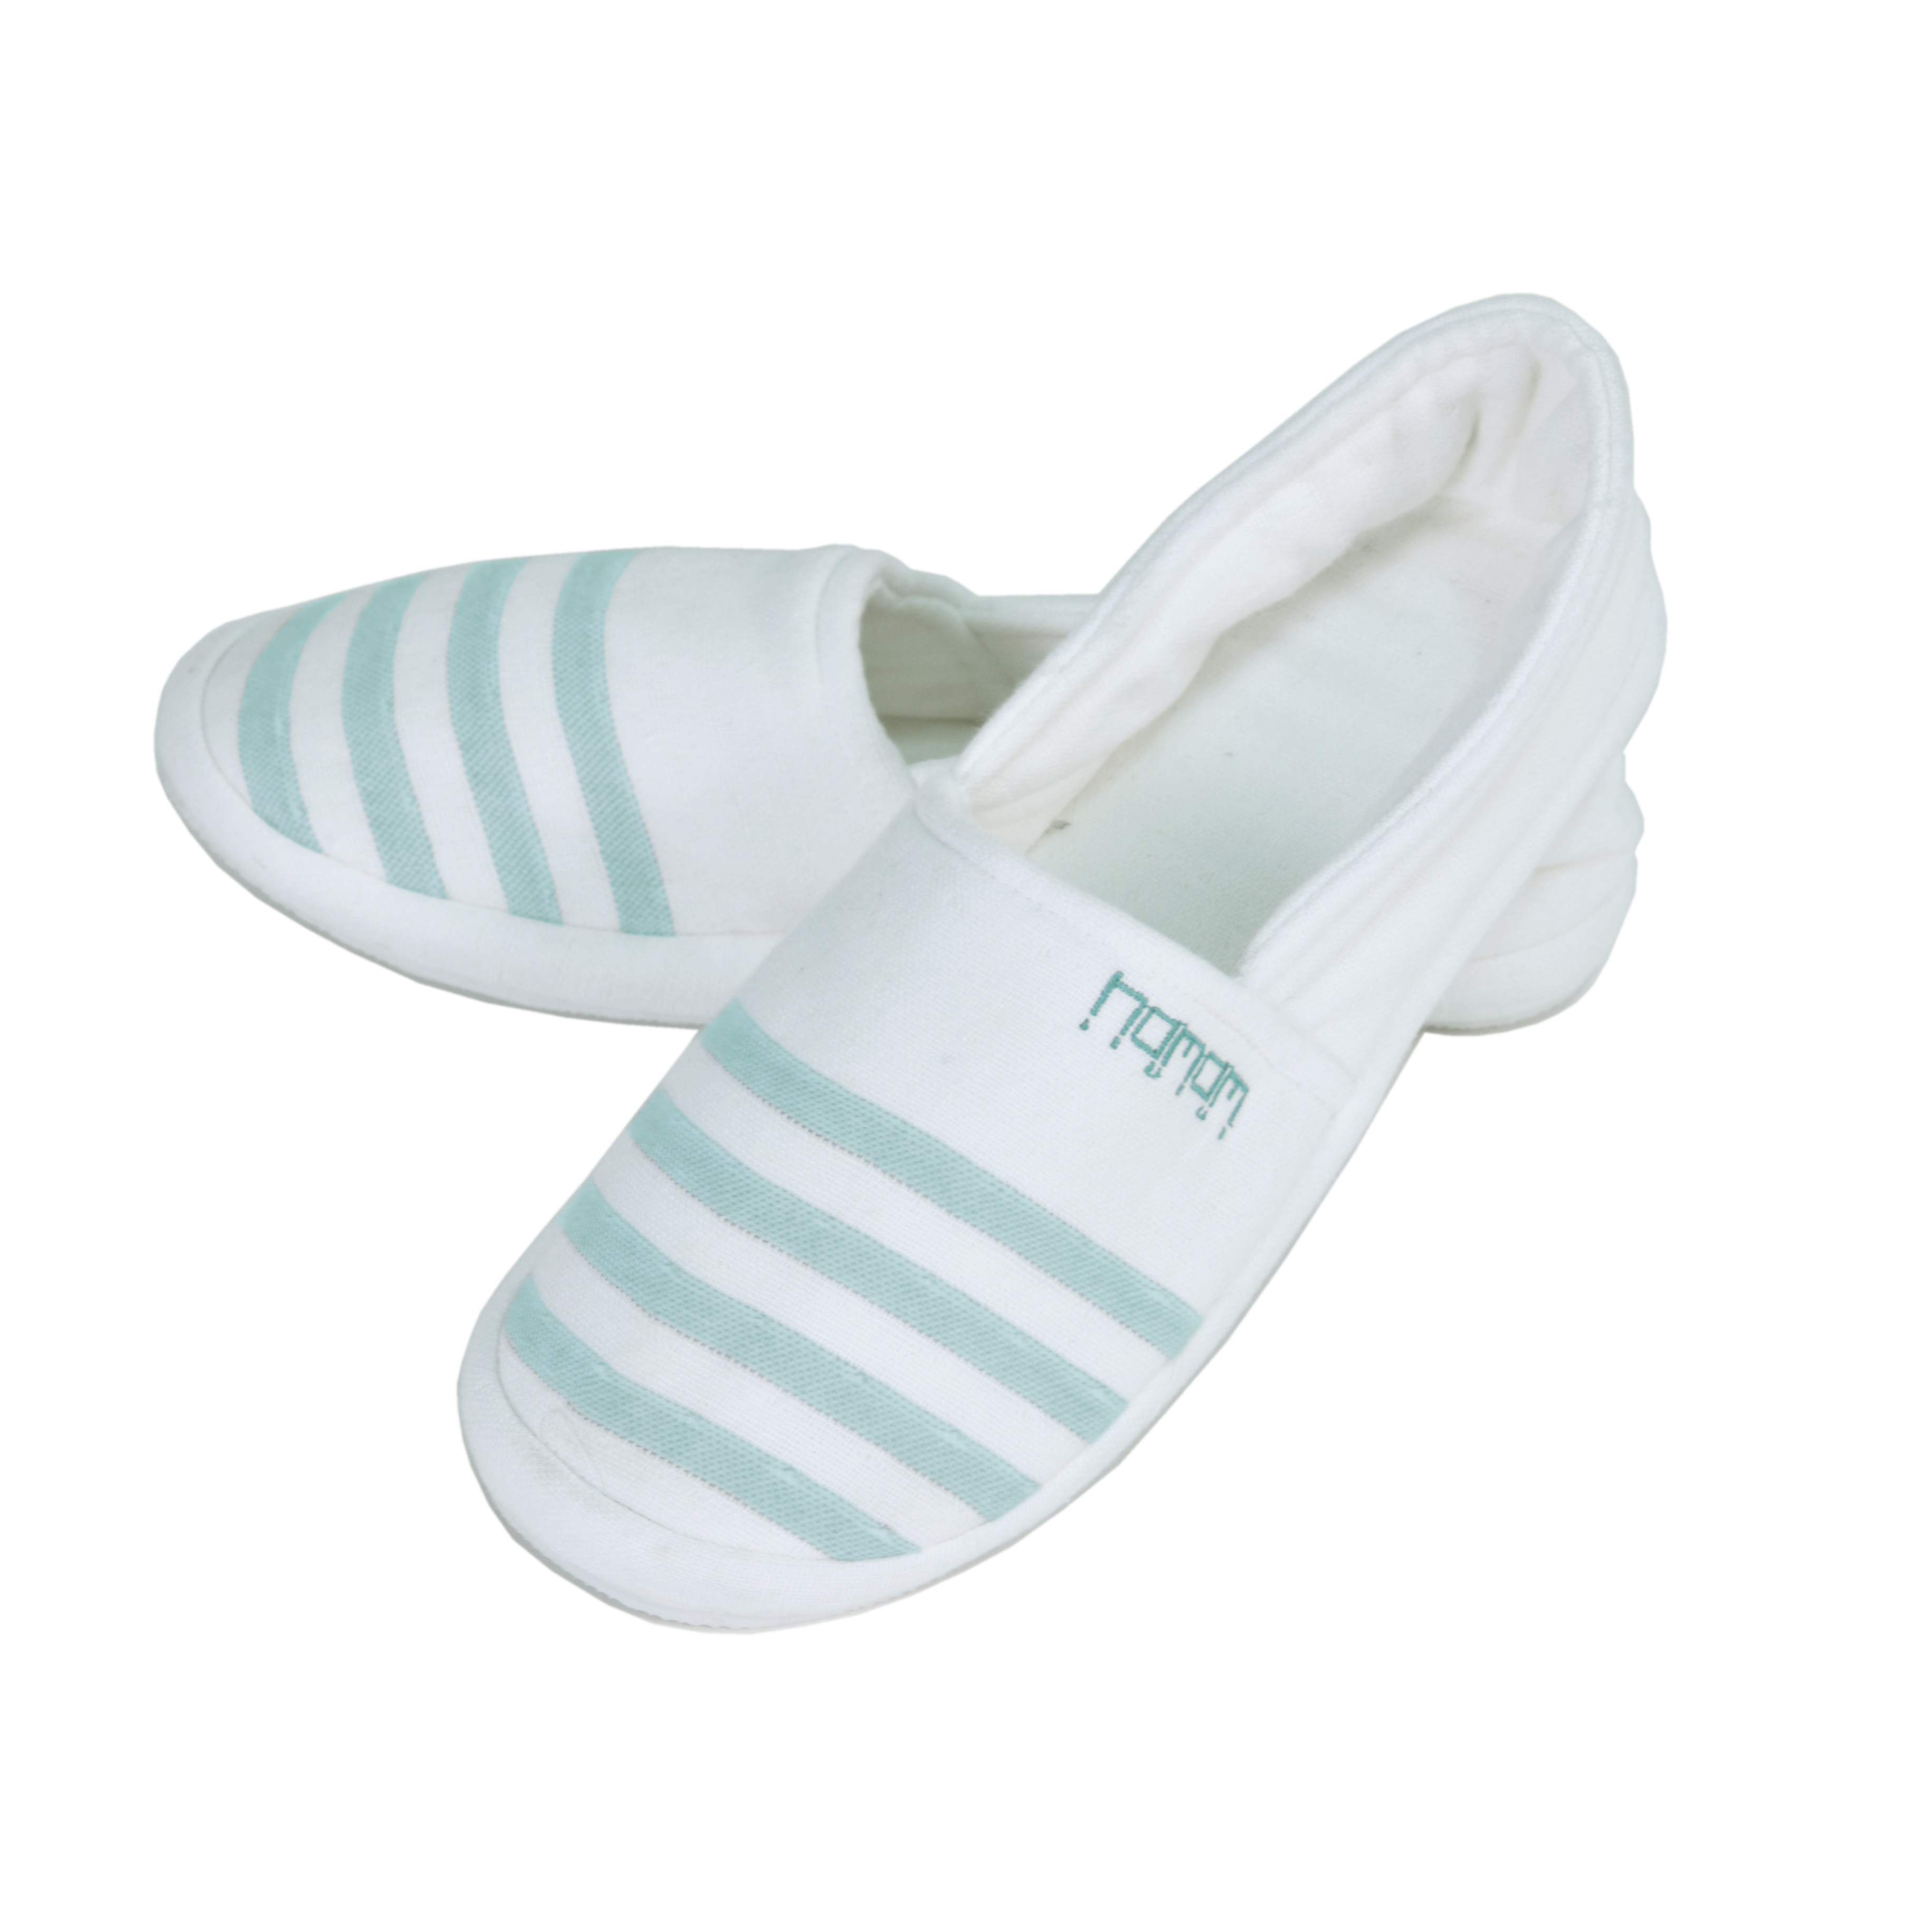 Тапочки Marine Цвет: Белый, Изумрудный (42-43) HAMAM ham436788